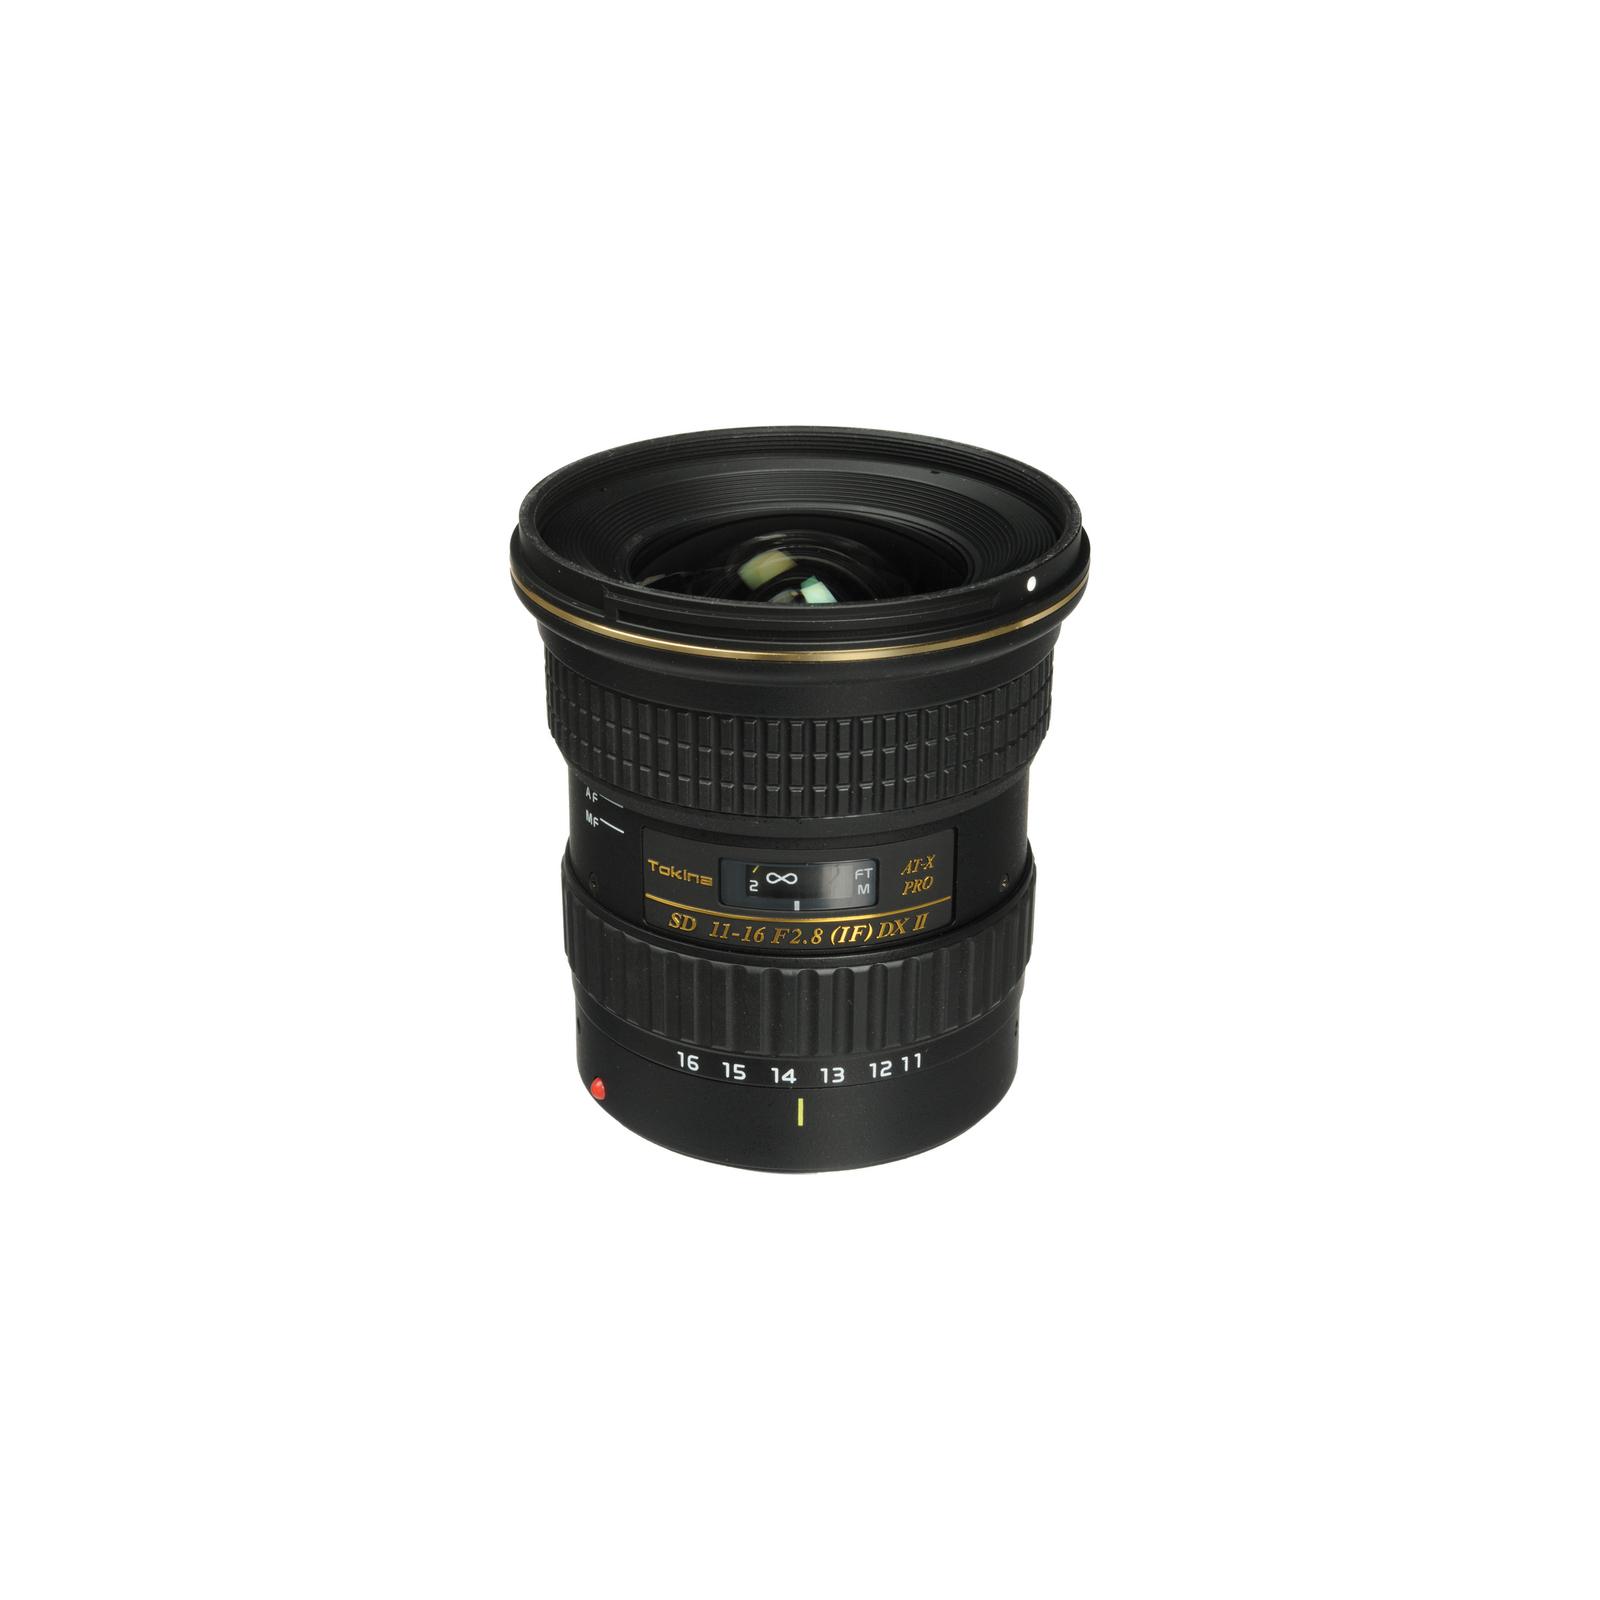 Объектив Tokina AT-X PRO DXII 11-16mm f/2.8 (Canon) (ATXAF116DXIIC) изображение 2